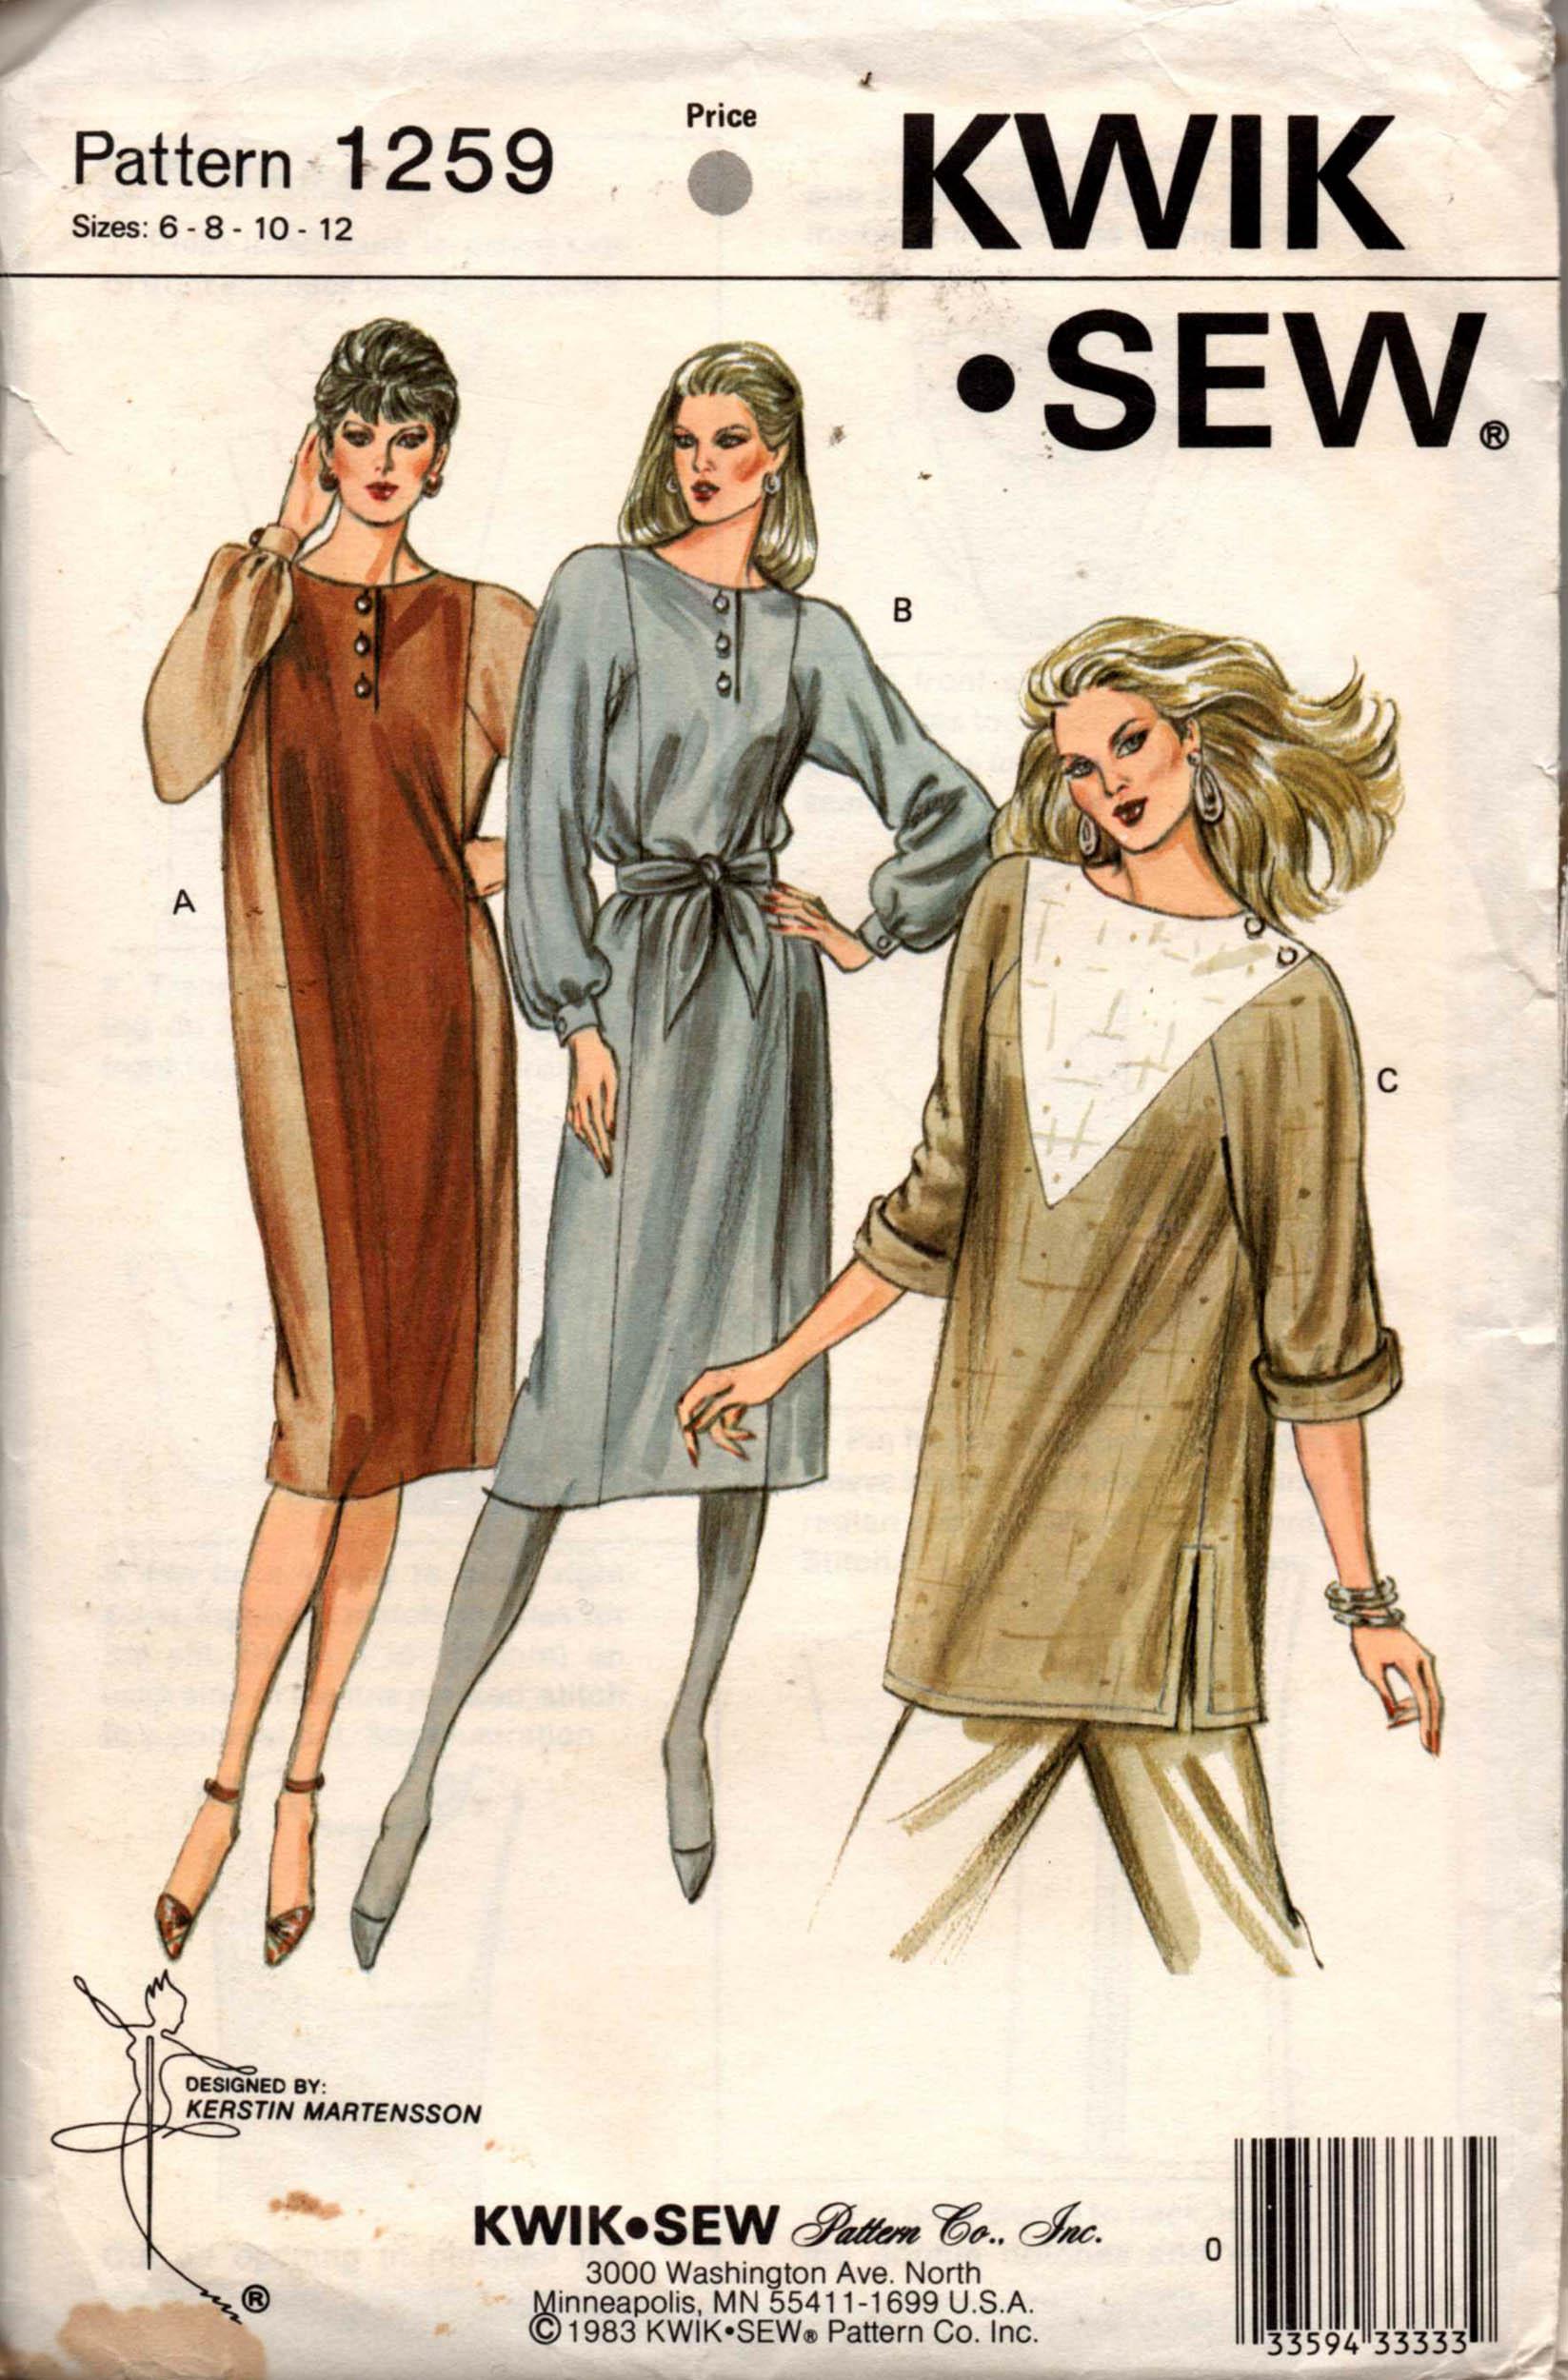 Kwik Sew 1259